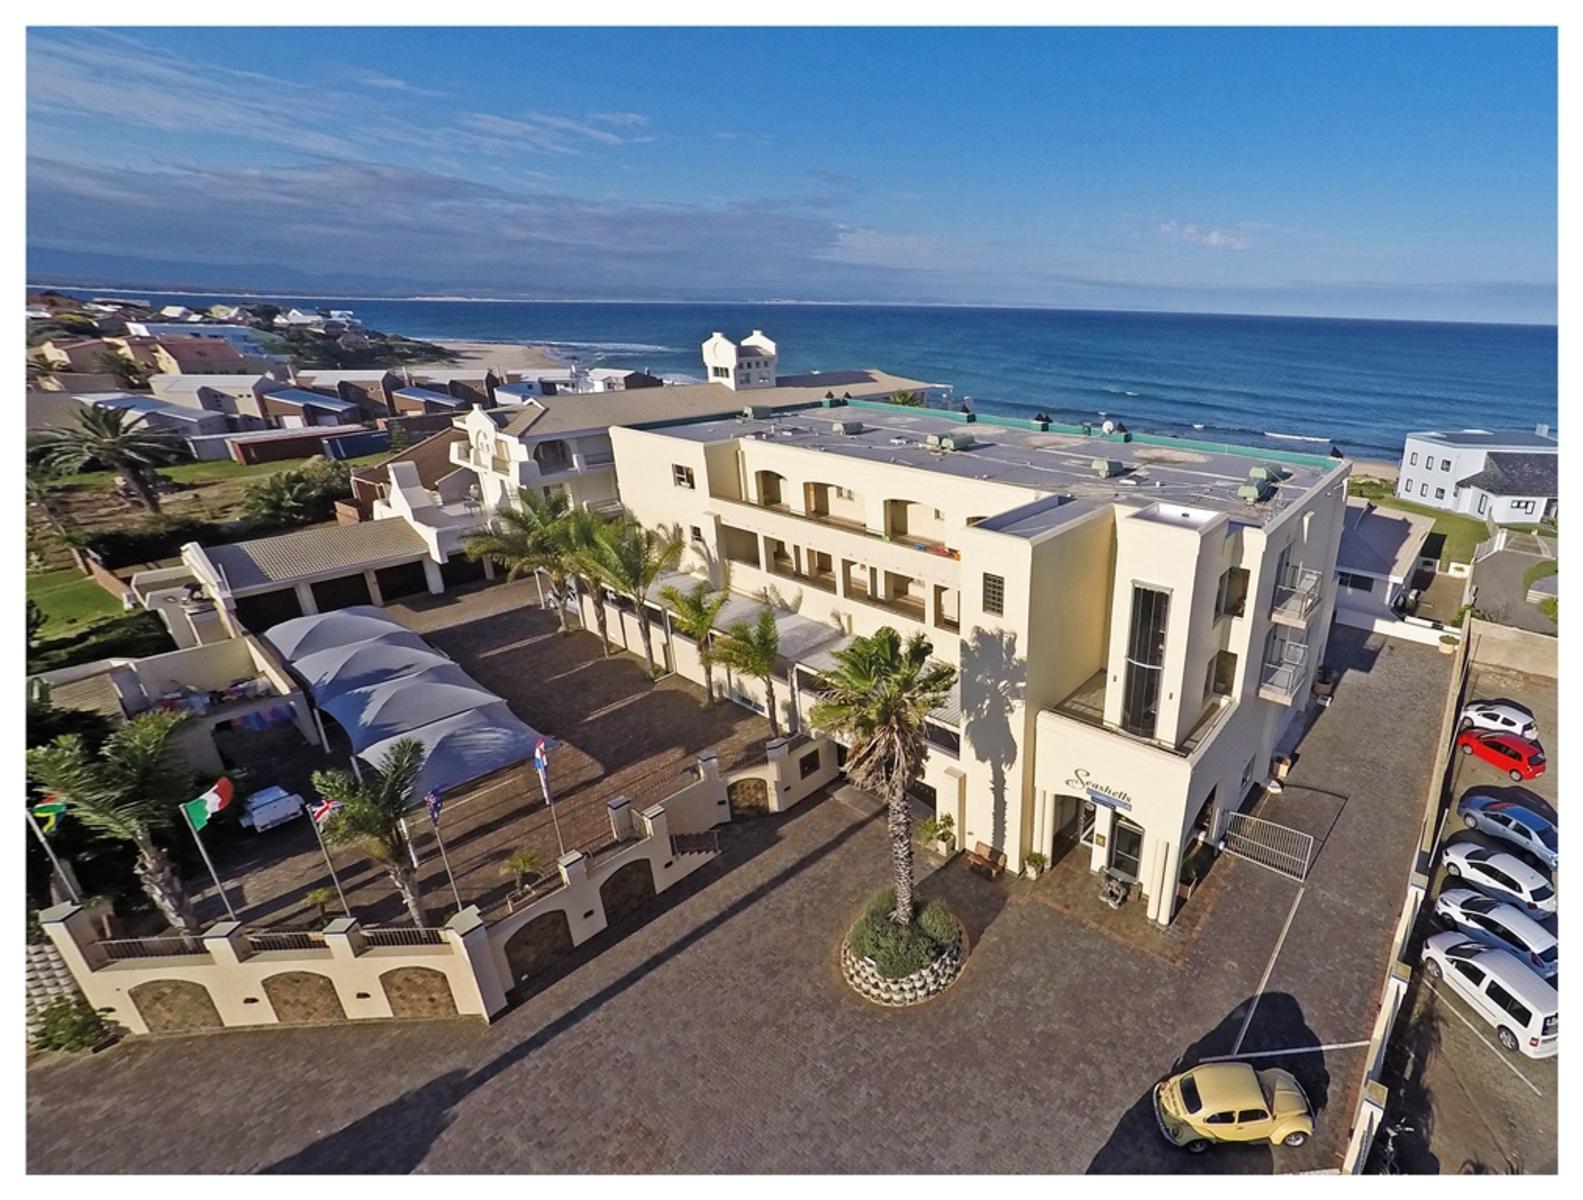 Seashells Luxury Apartments